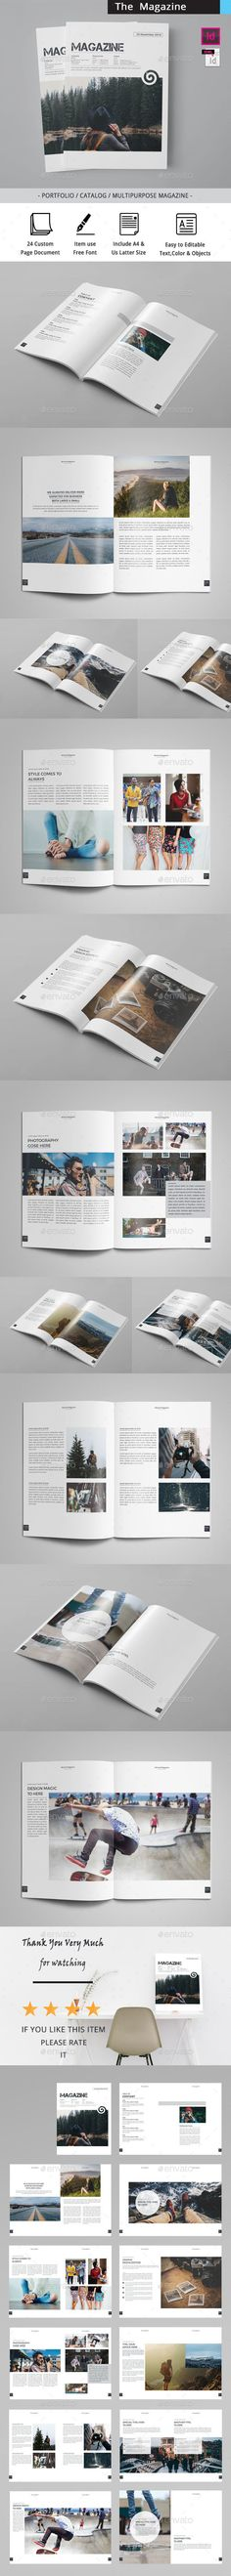 The Magazine - Magazines Print Templates Download here : https://graphicriver.net/item/the-magazine/19226749?s_rank=77&ref=Al-fatih